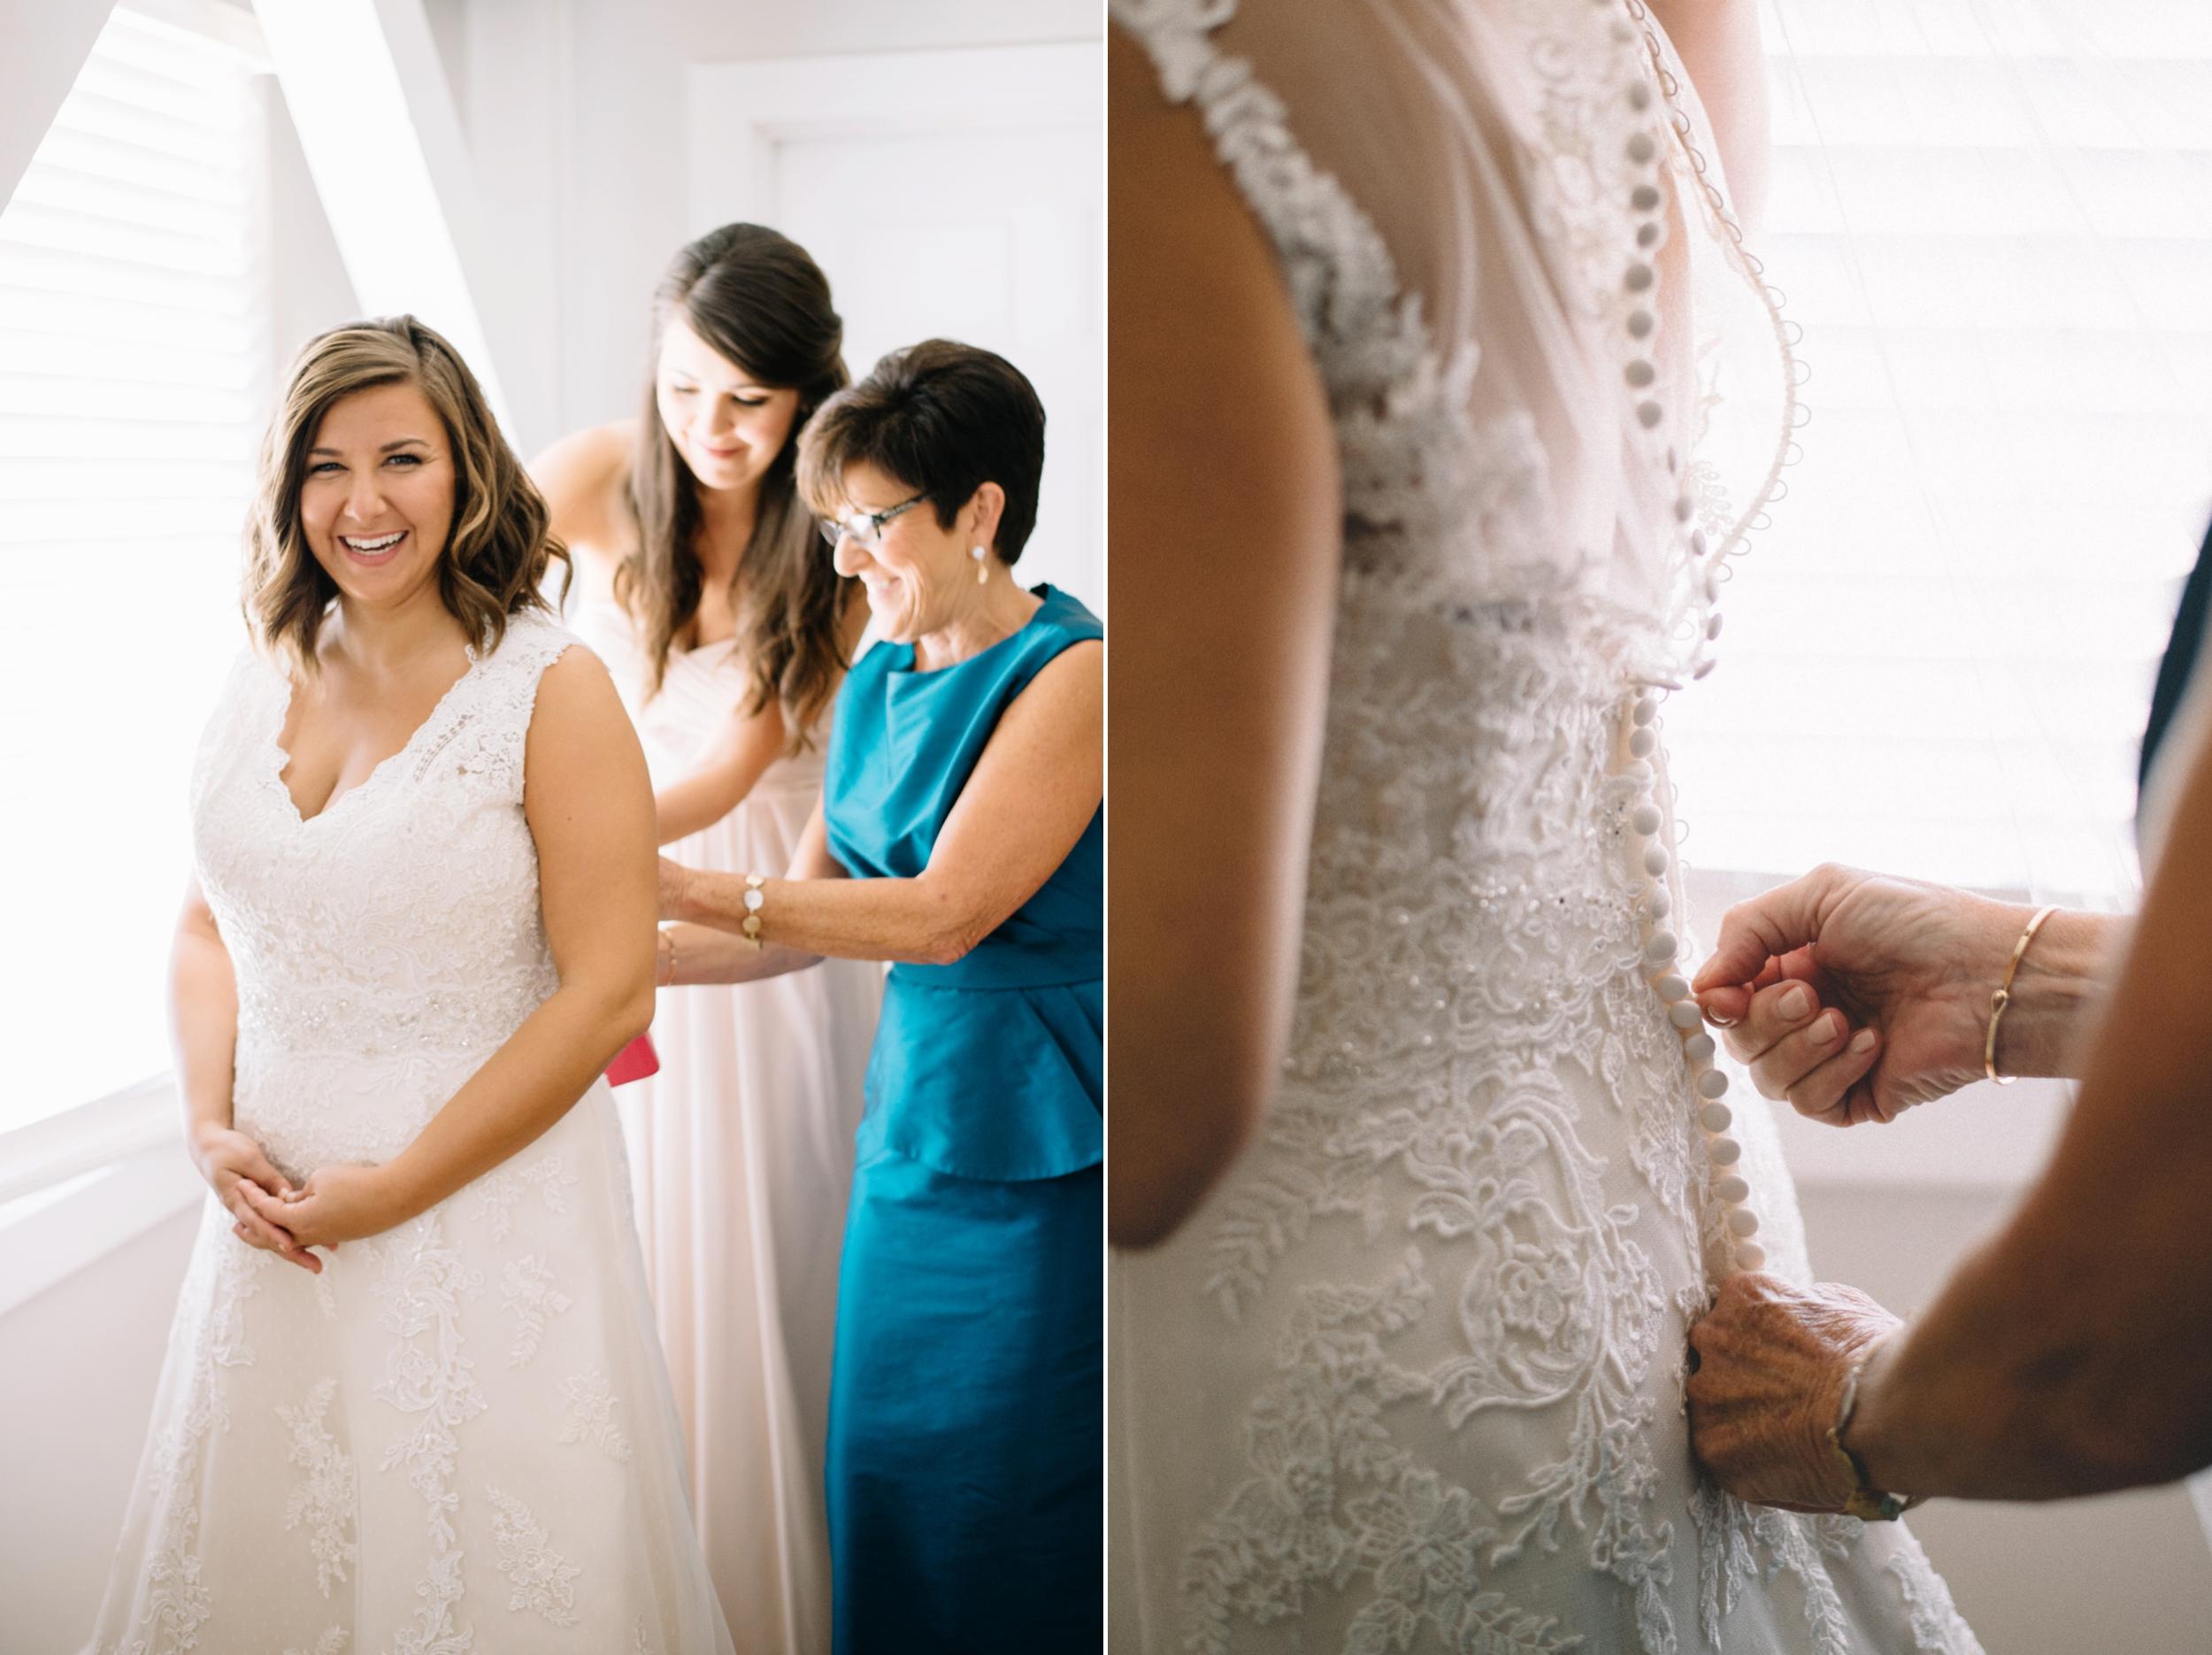 Charleston-wedding-photographer-14.jpg